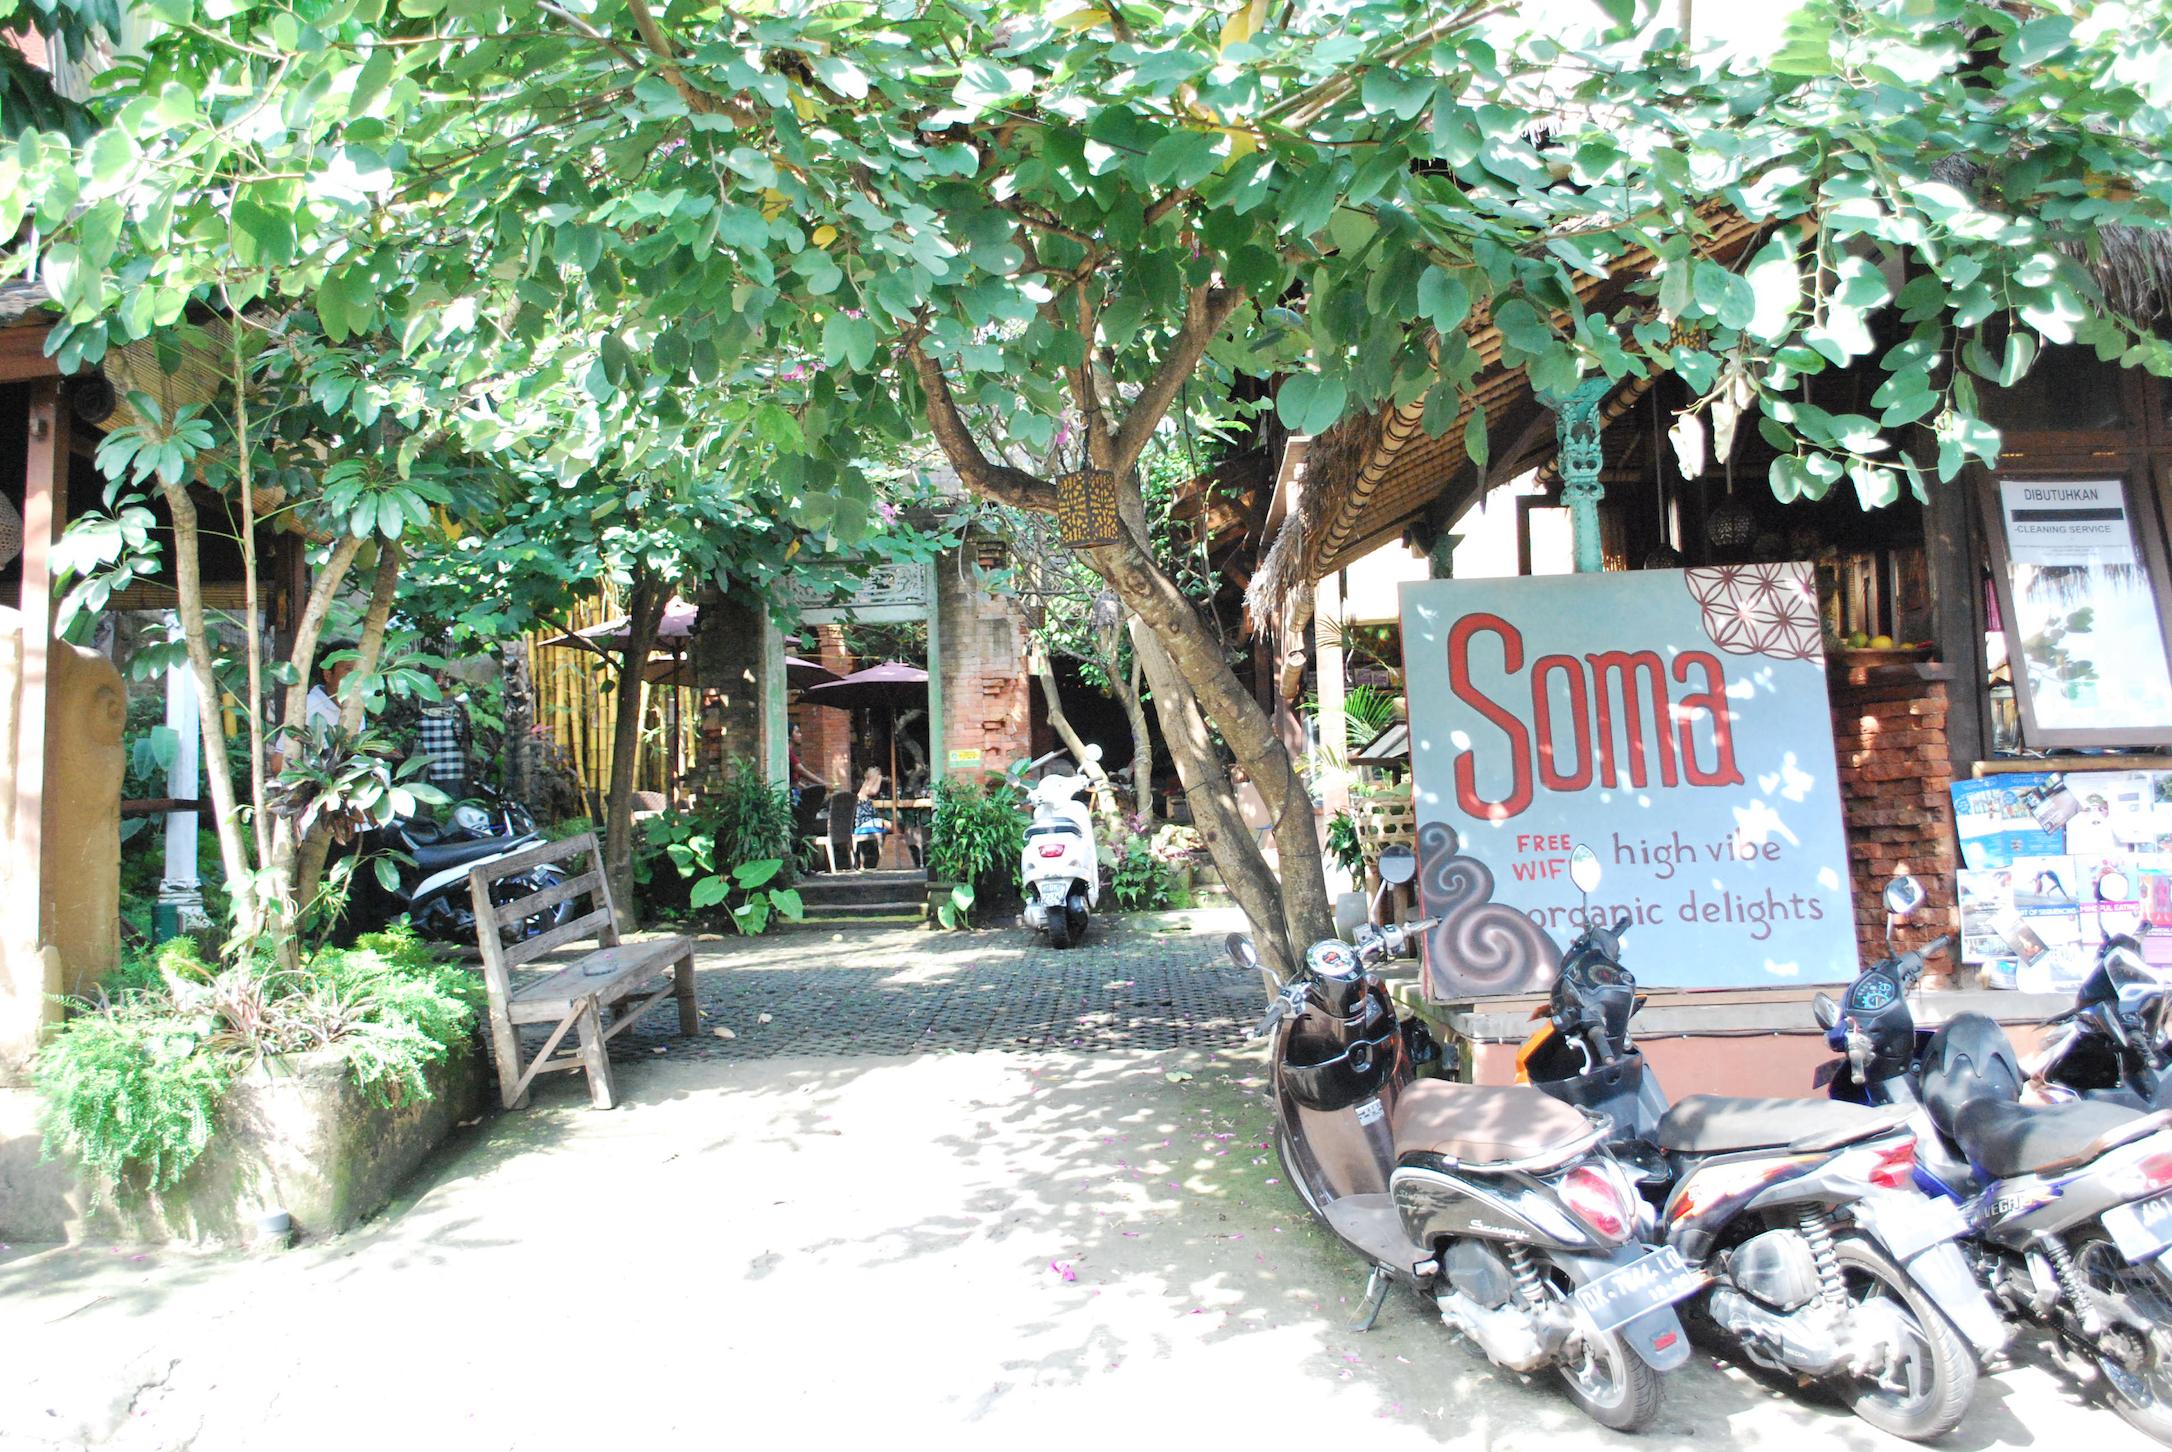 SOMA Café